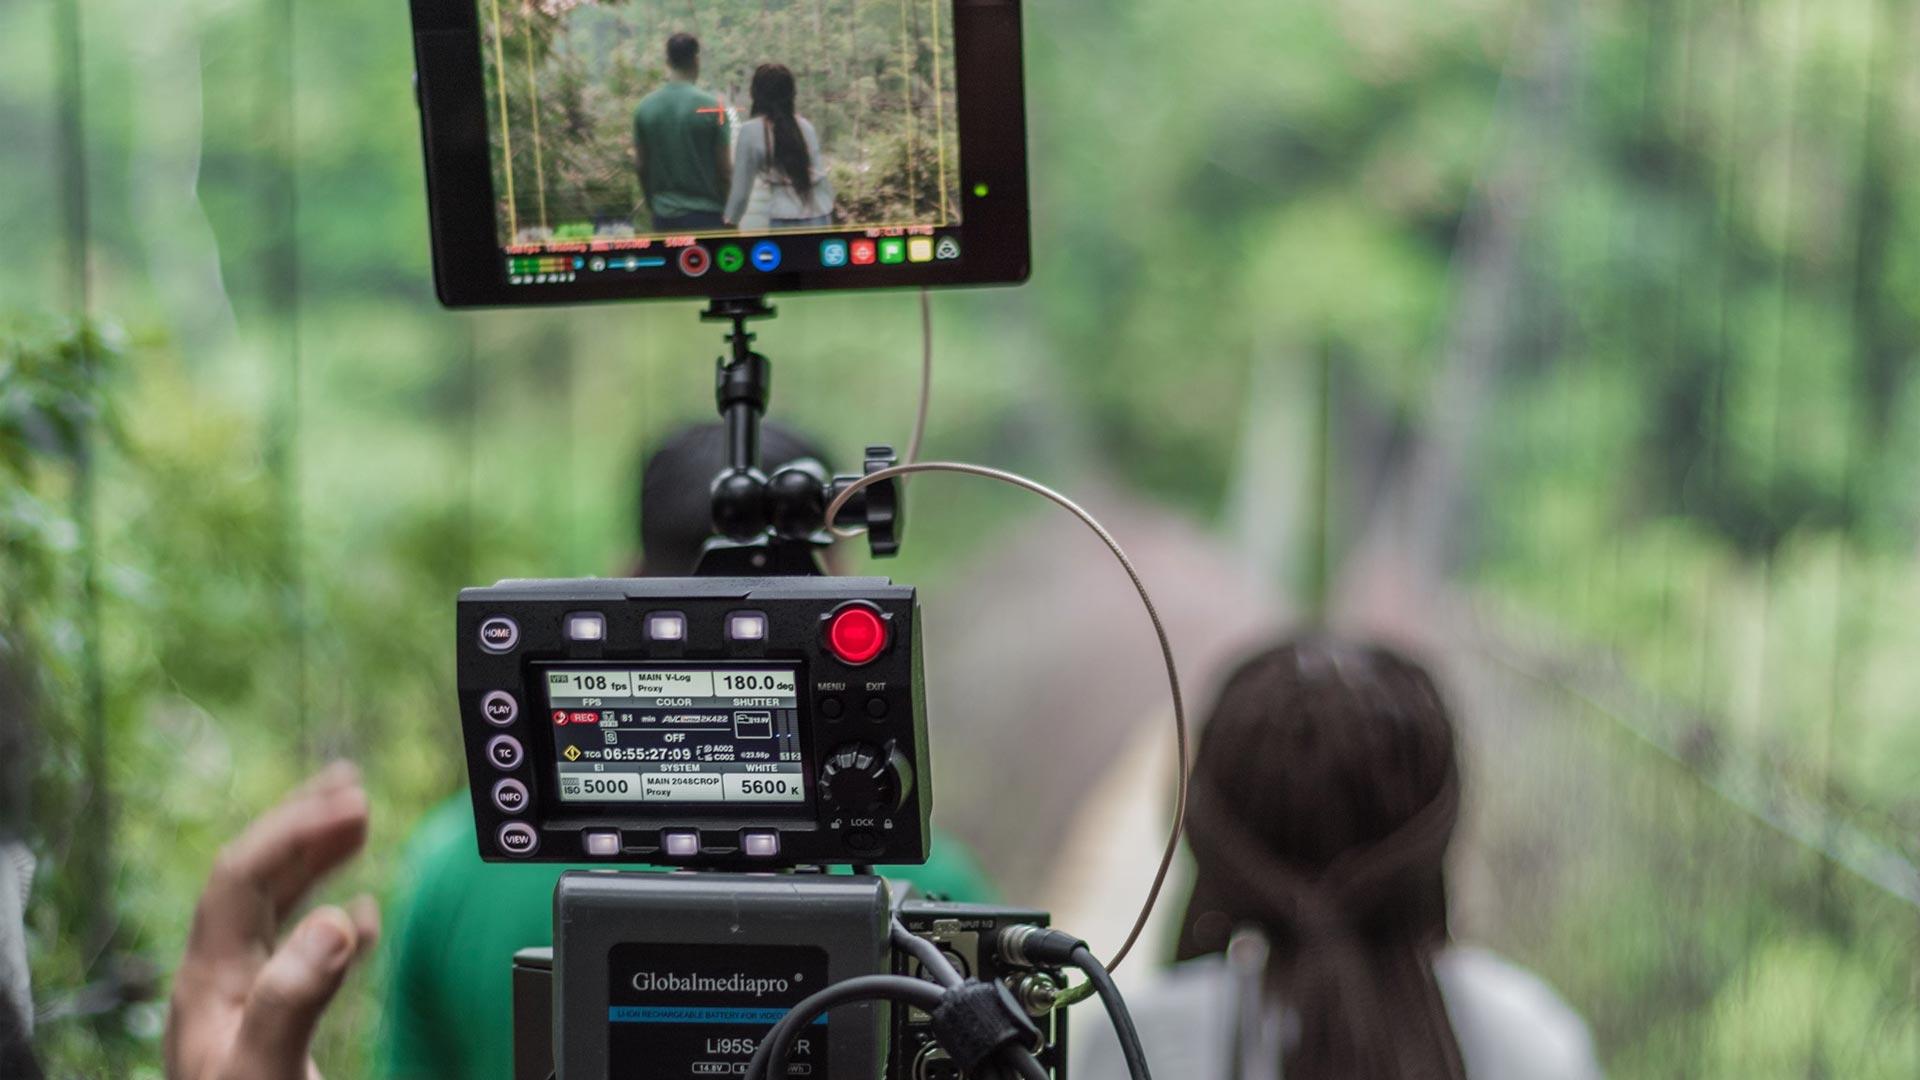 Festival de Cine de Costa Rica invita a convocatoria a hondureños